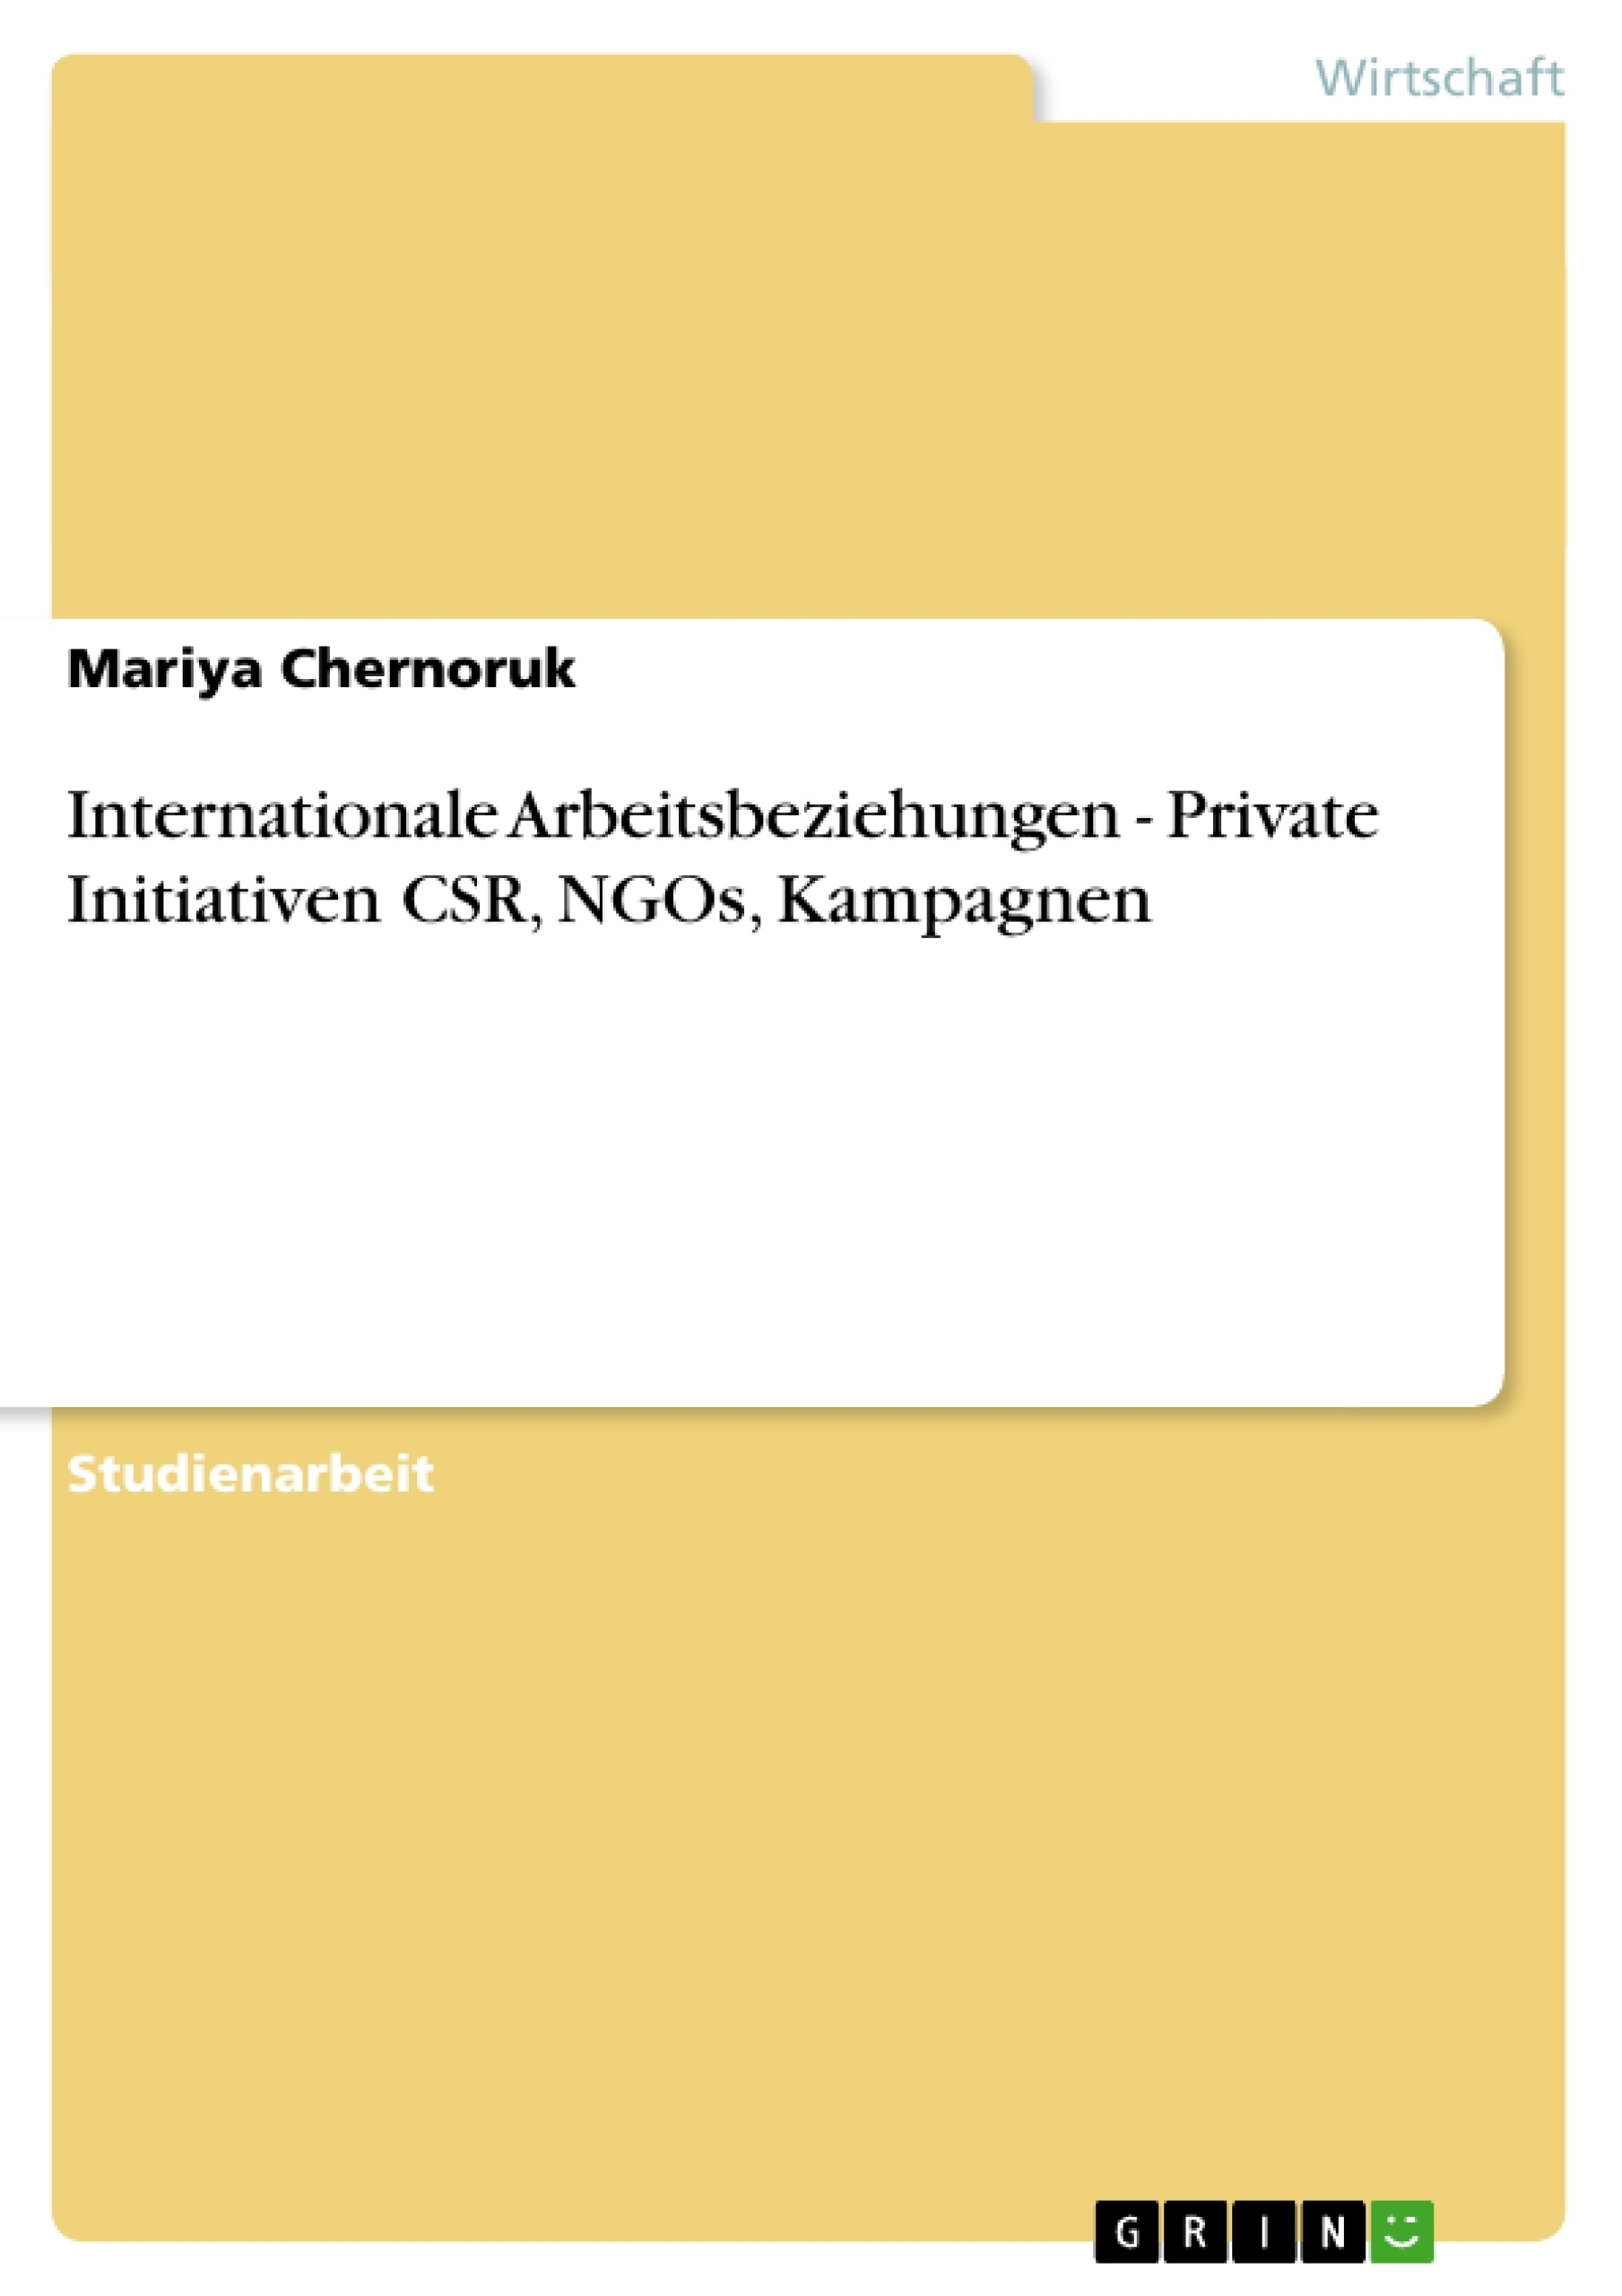 Titel: Internationale Arbeitsbeziehungen - Private Initiativen CSR, NGOs, Kampagnen